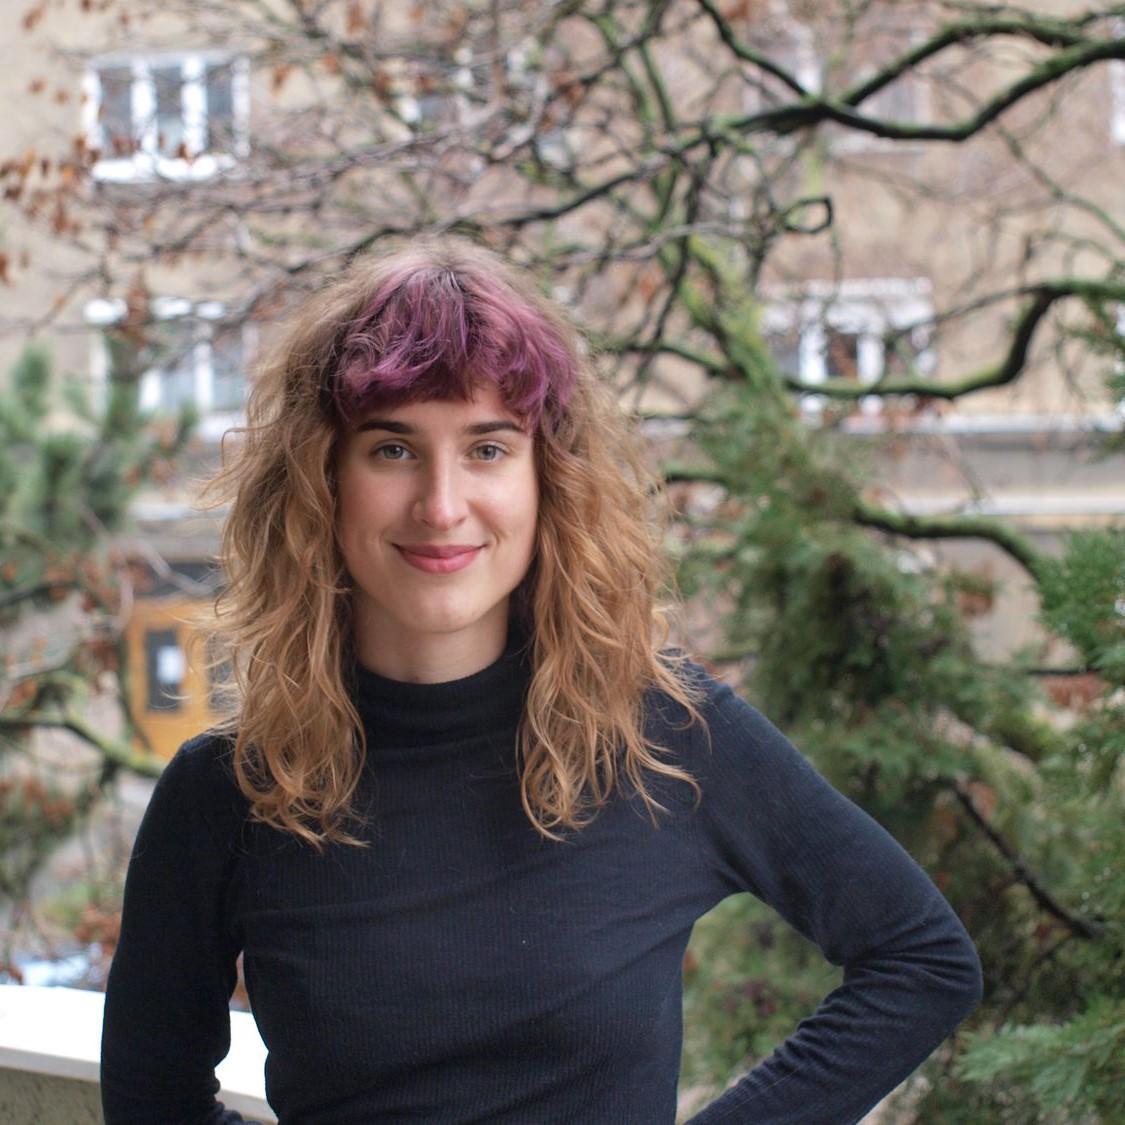 Lýdia Grešáková / Participatory Processes Consultant